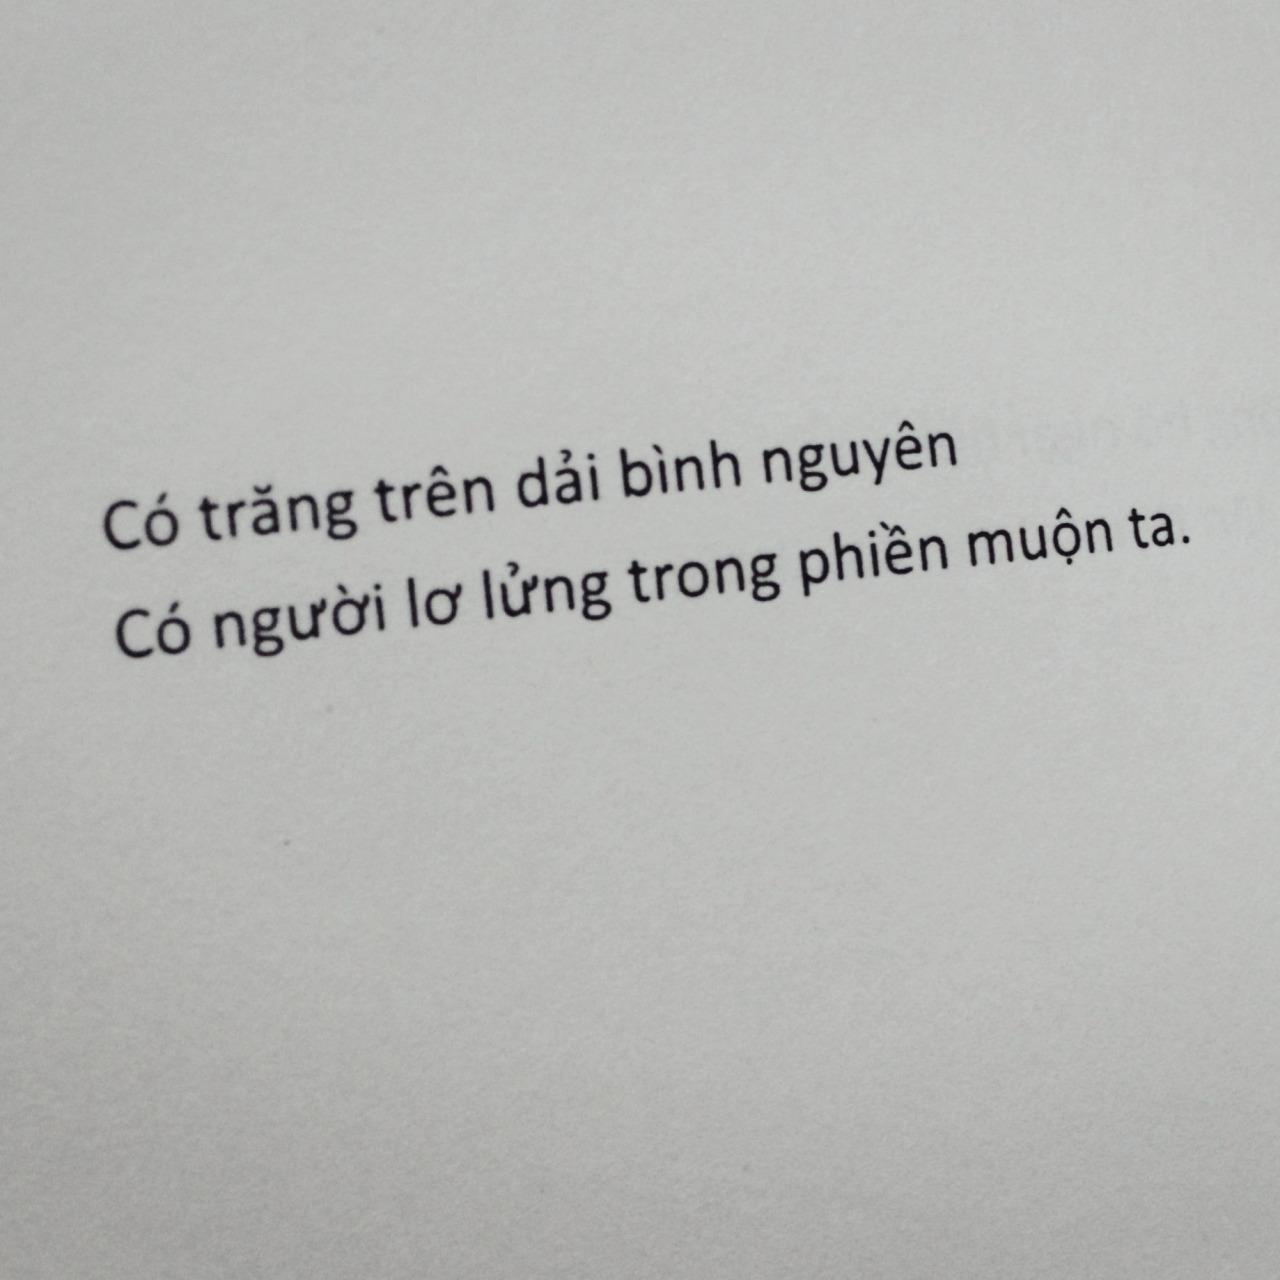 nhung-cau-tho-hay-y-nghia-sau-sac-nhat-ve-cuoc-song-cua-tac-gia-nguyen-thien-ngan-4